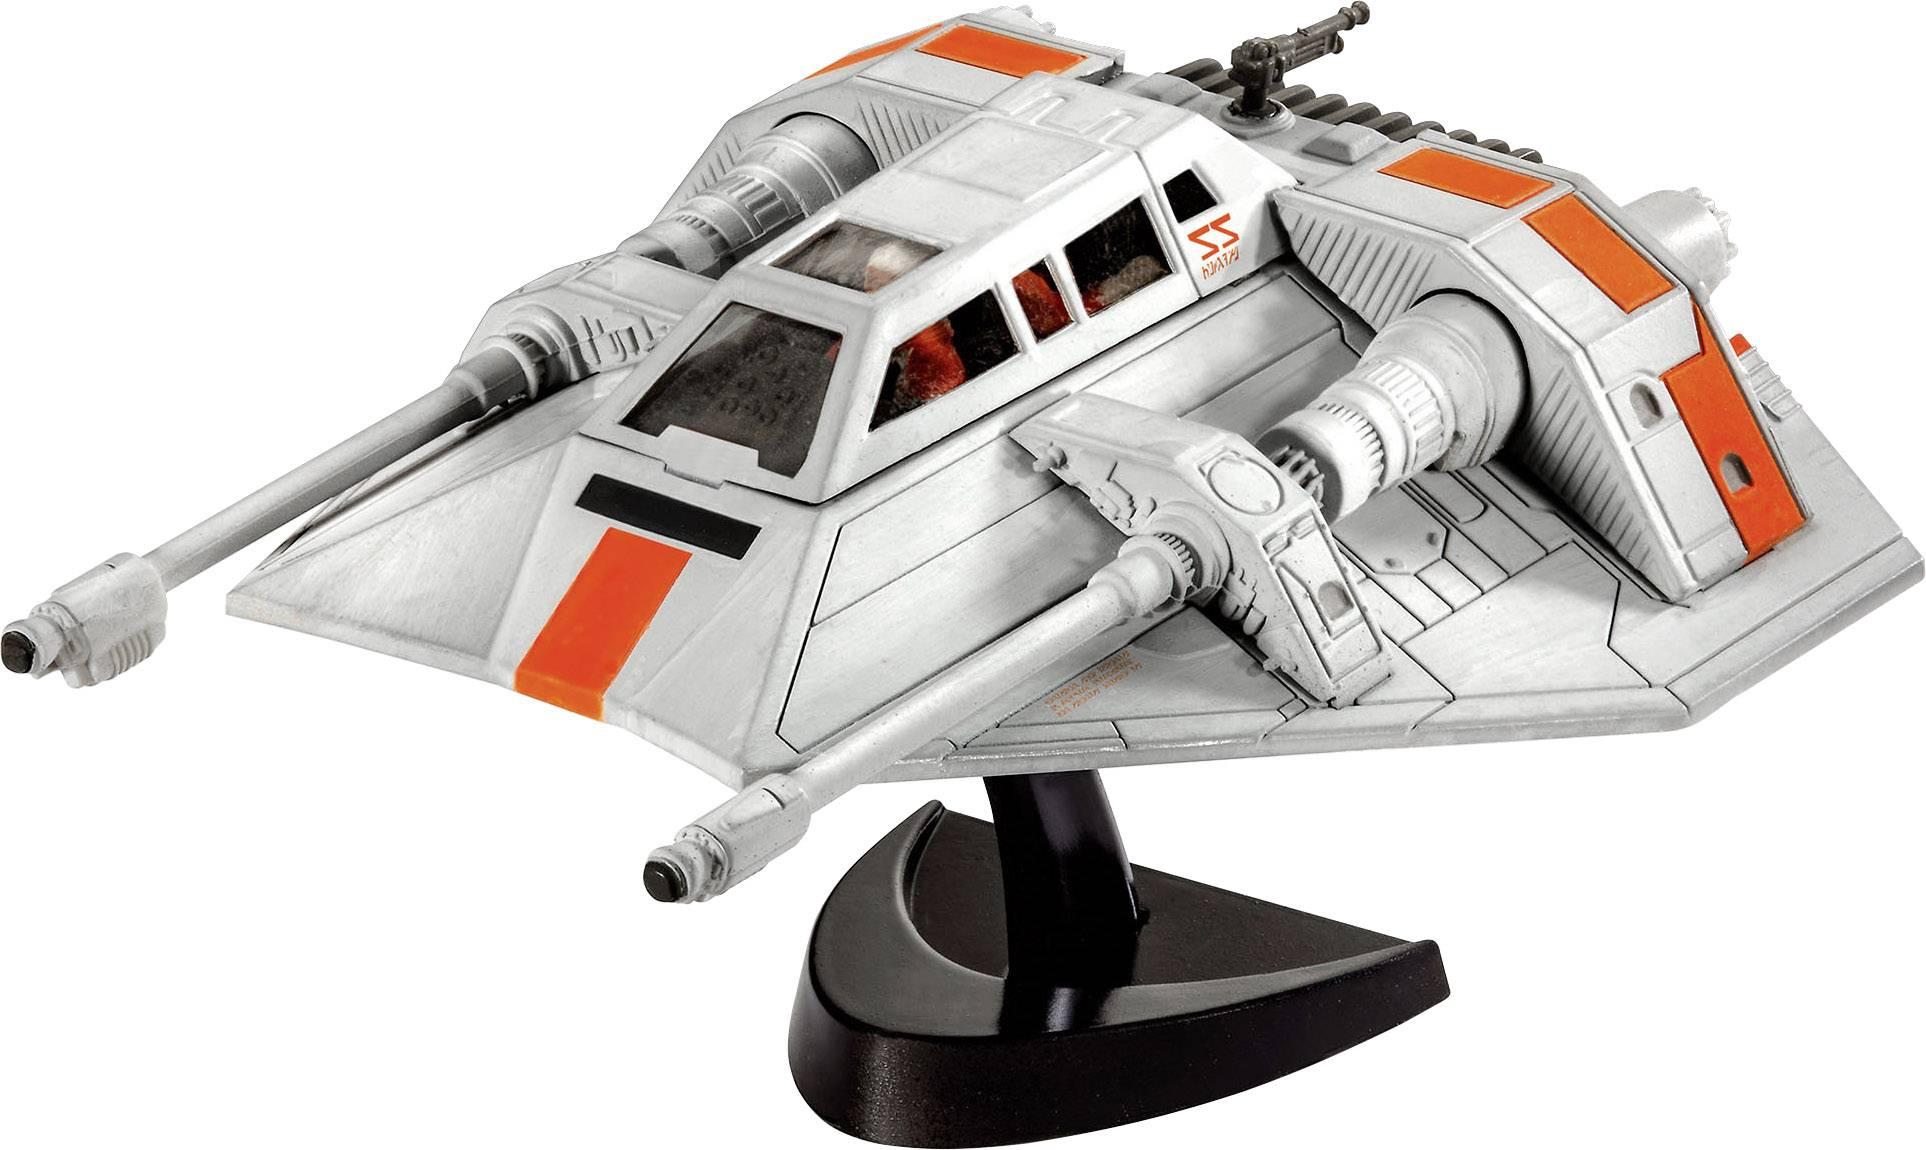 Star Wars Snow Speeder, sci-fi model, stavebnica Revell 03604